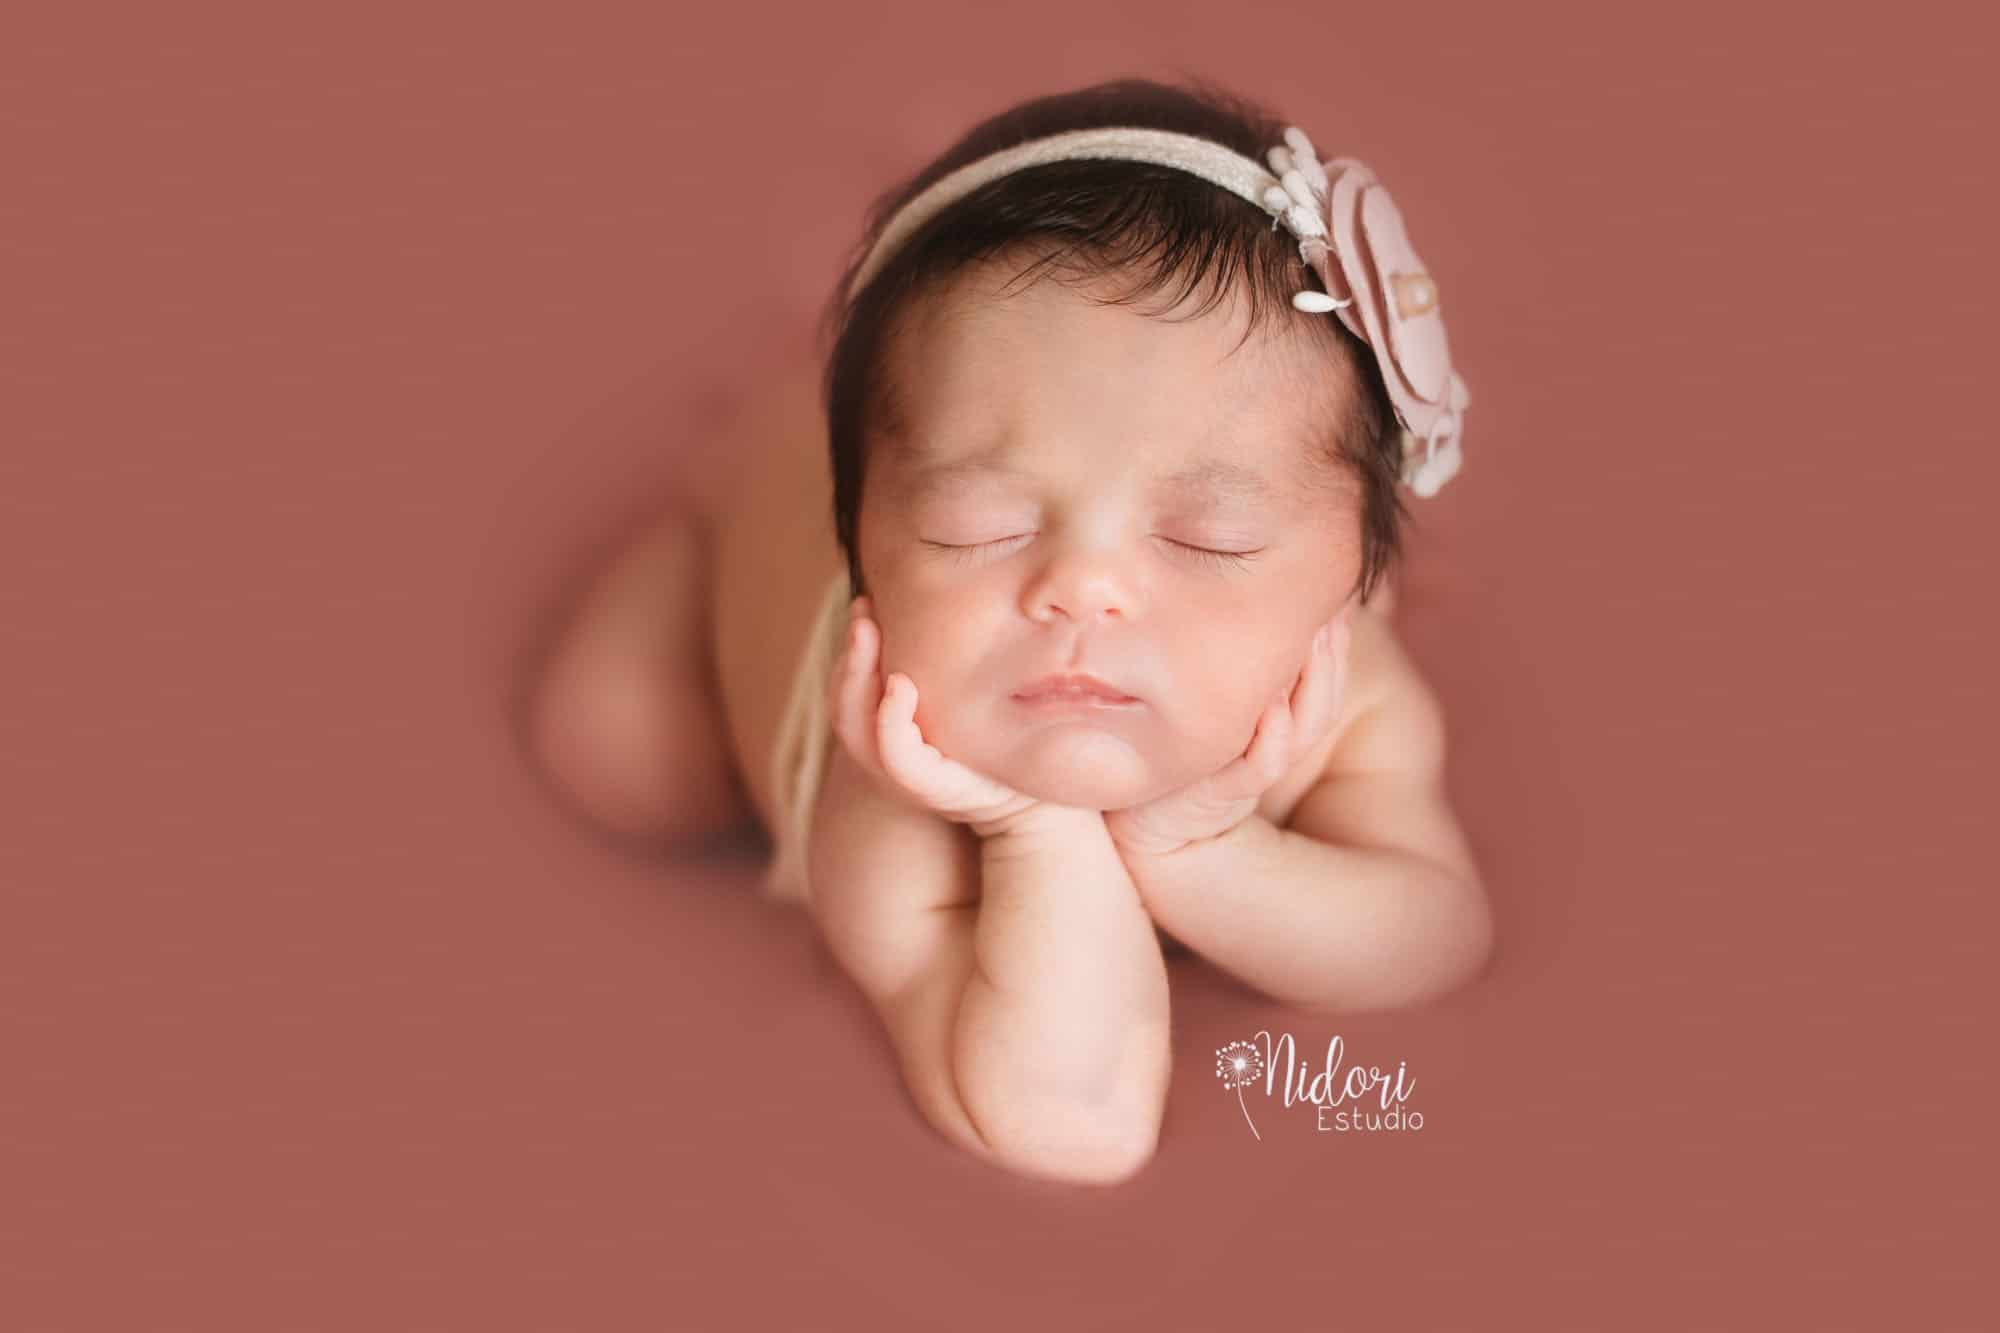 fotosbebe-fotografia-recien-nacido-newborn-bebes-nidoriestudio-fotos-valencia-almazora-castellon-españa-spain-14